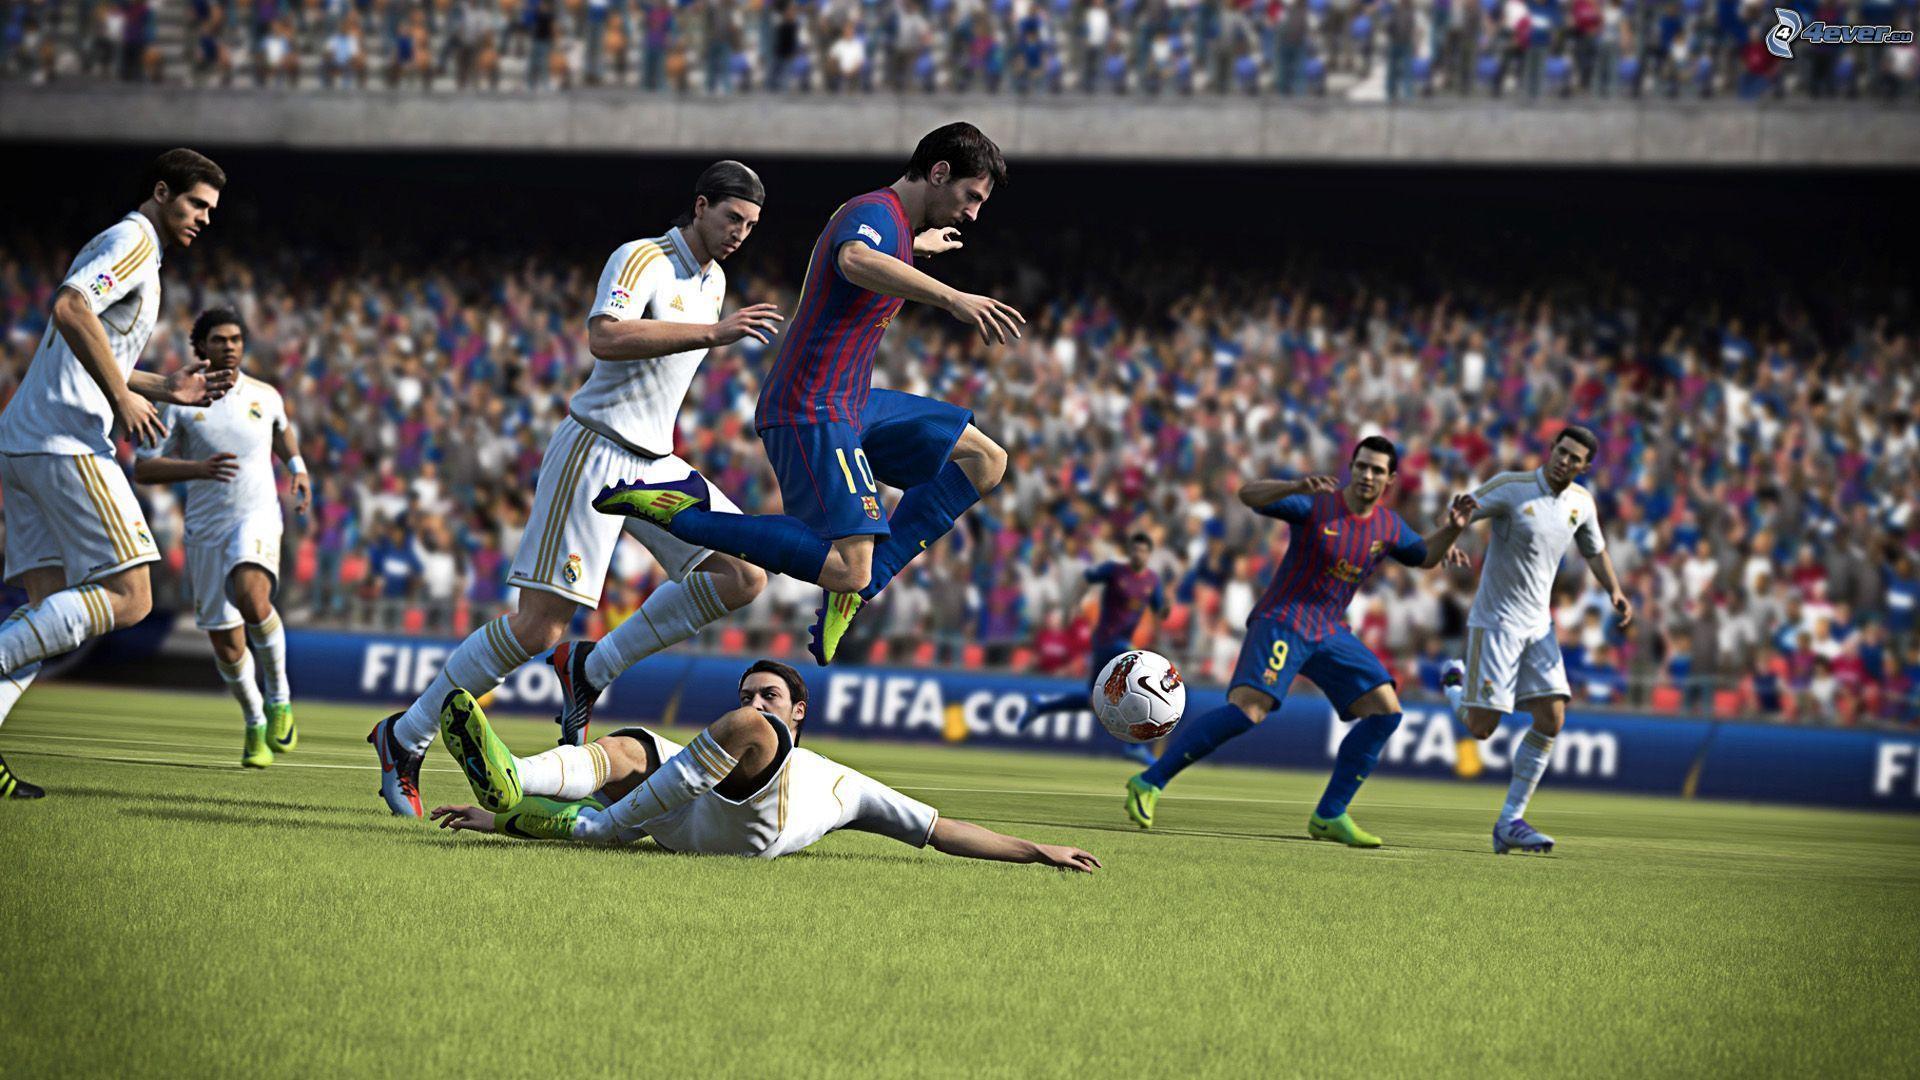 FIFA HD Wallpapers - HD Wallpapers Inn